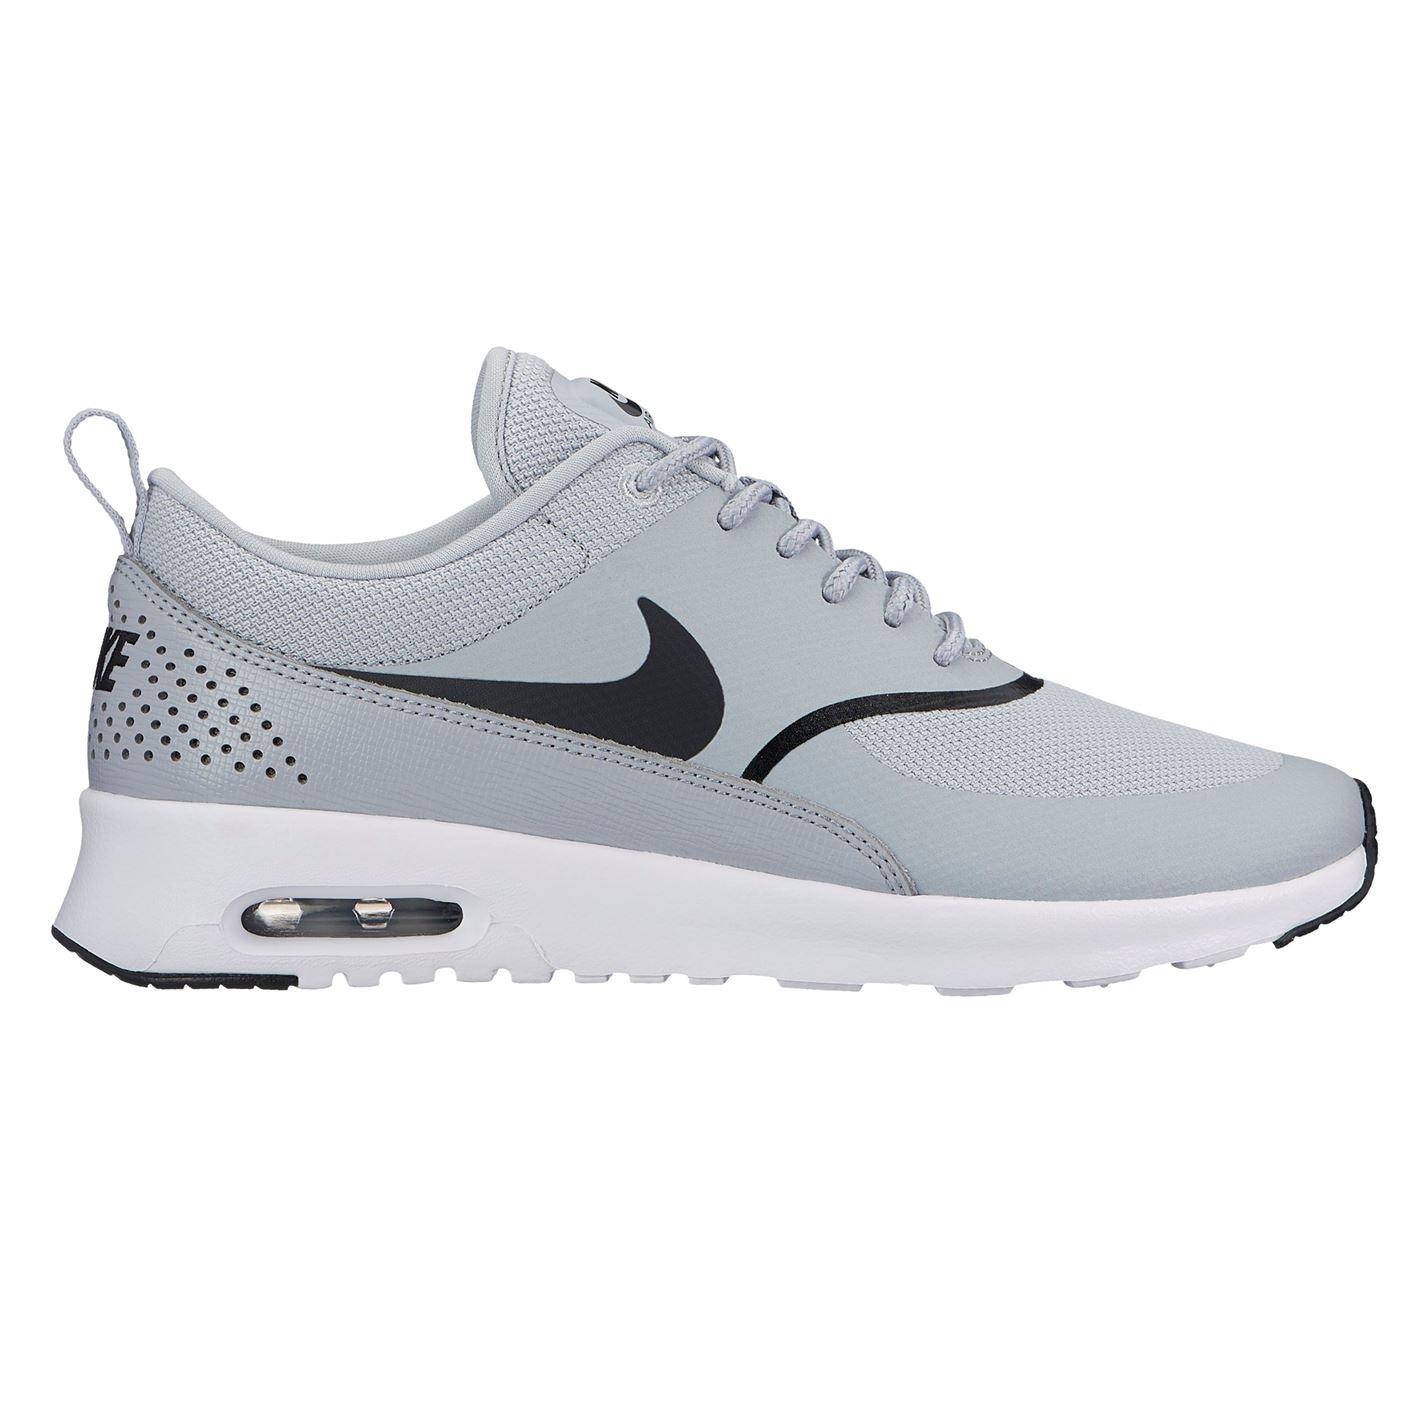 boty Nike Air Max Thea dámské